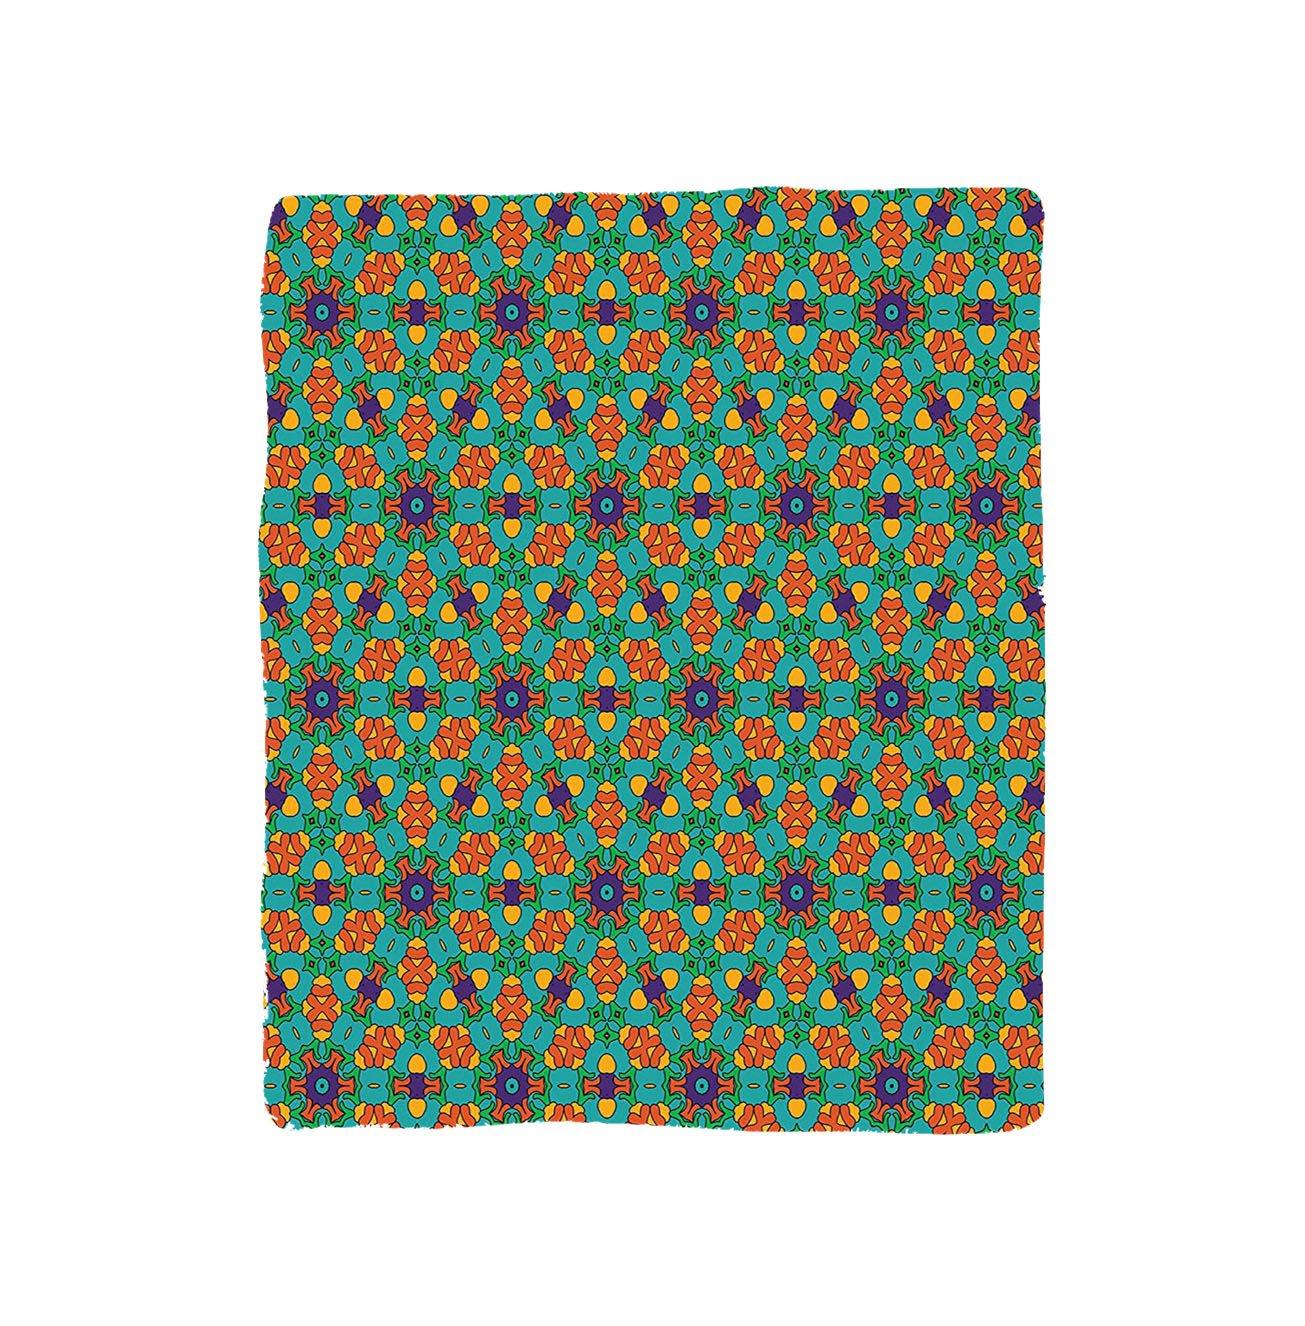 VROSELV Custom Blanket Orange Living Room for India Ethnic Design Lovers Floral Print Bedroom Living Room Dorm Fern Green Marigold and Navy Blue